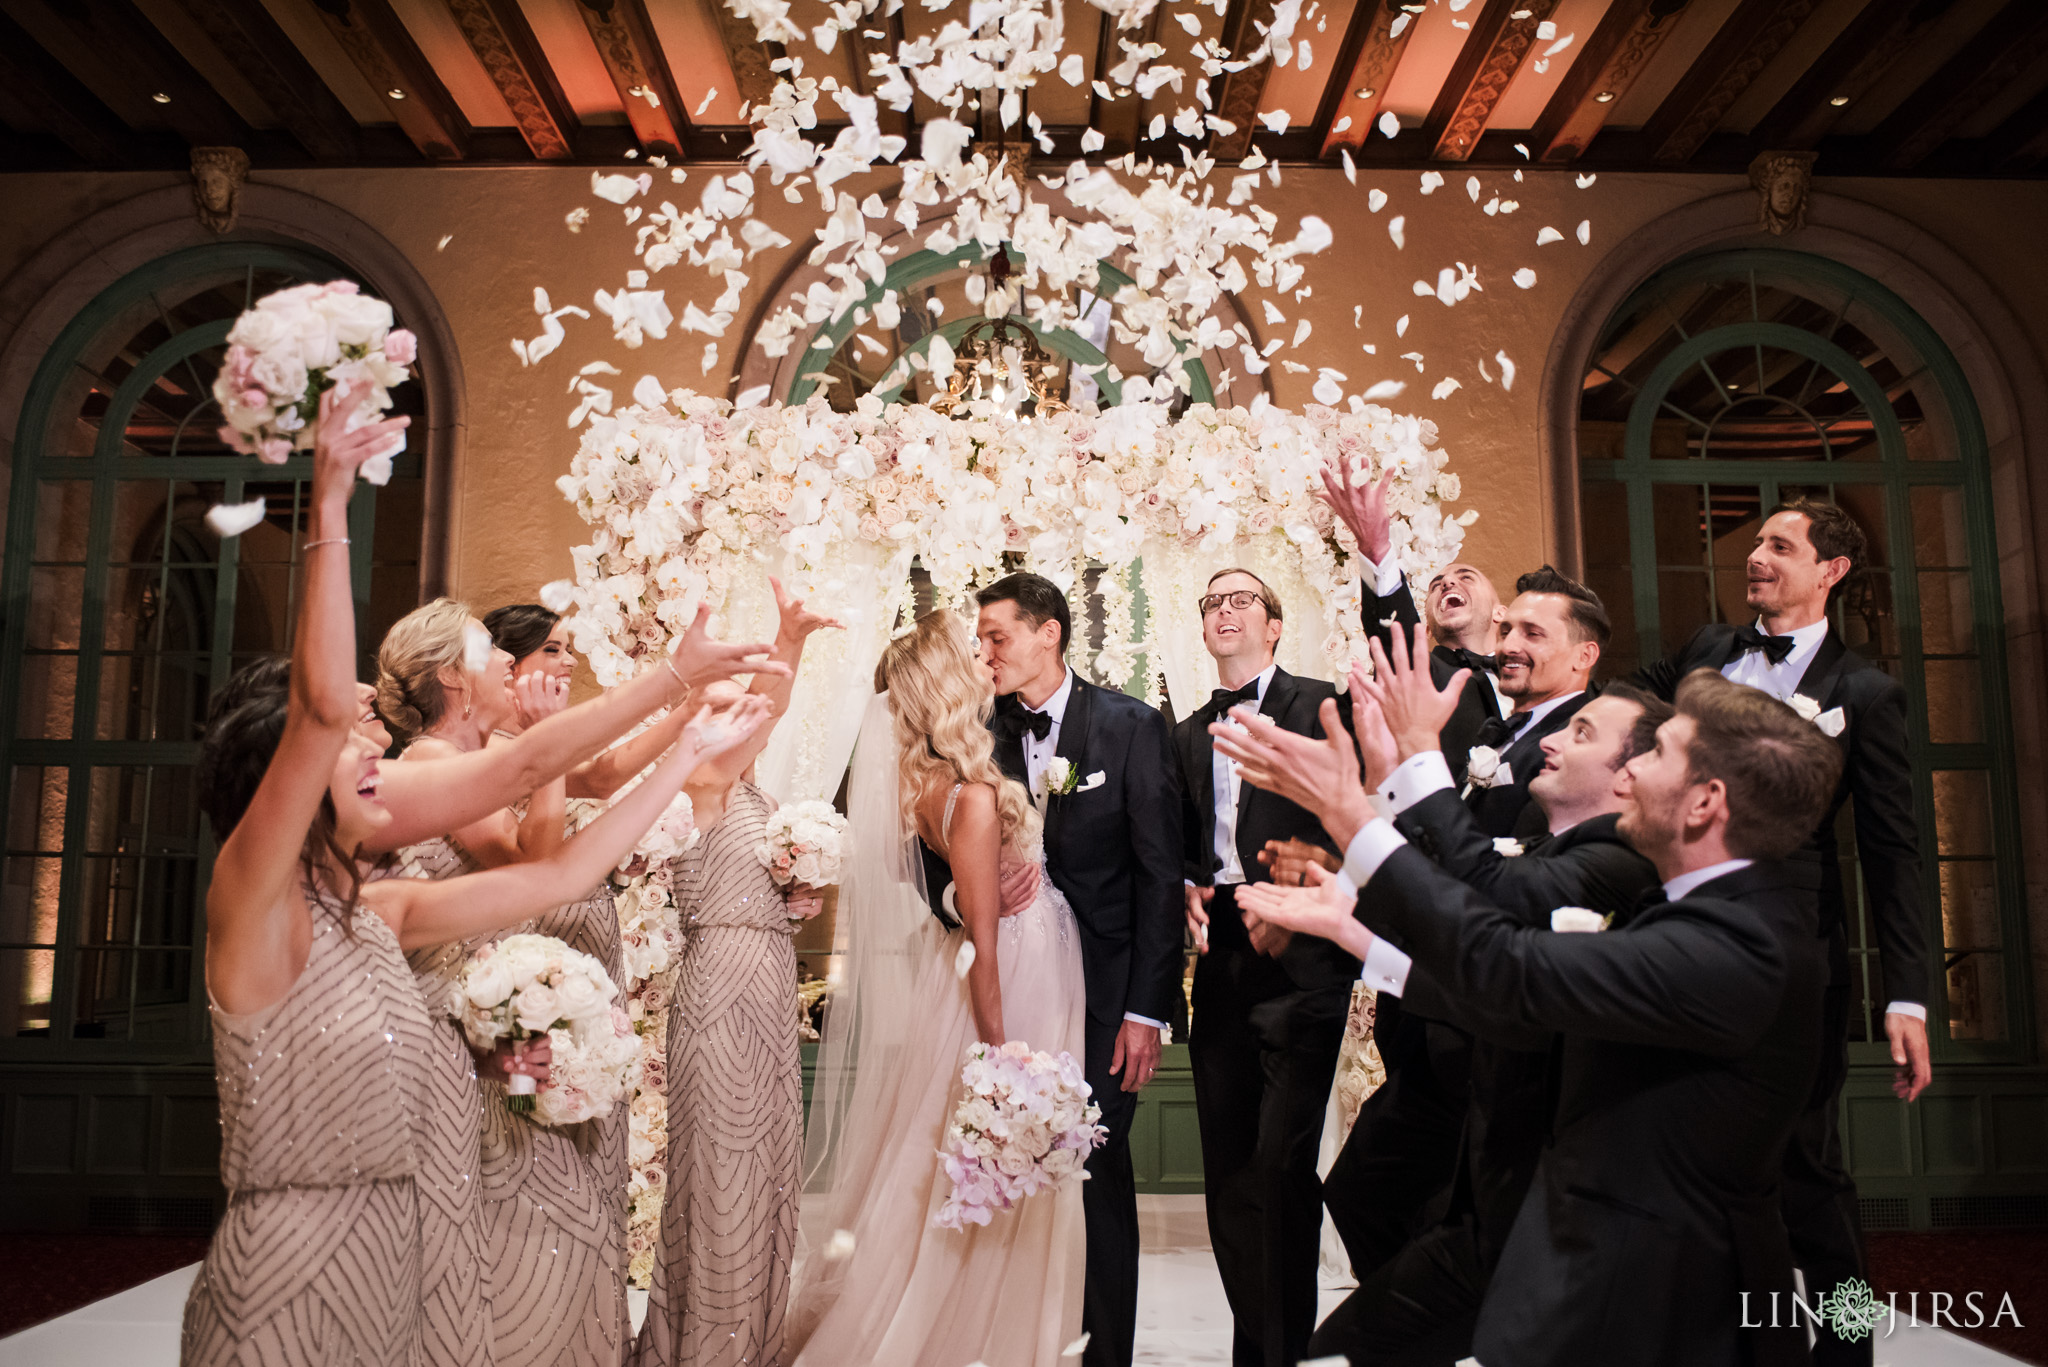 014 millennium biltmore hotel los angeles wedding photography